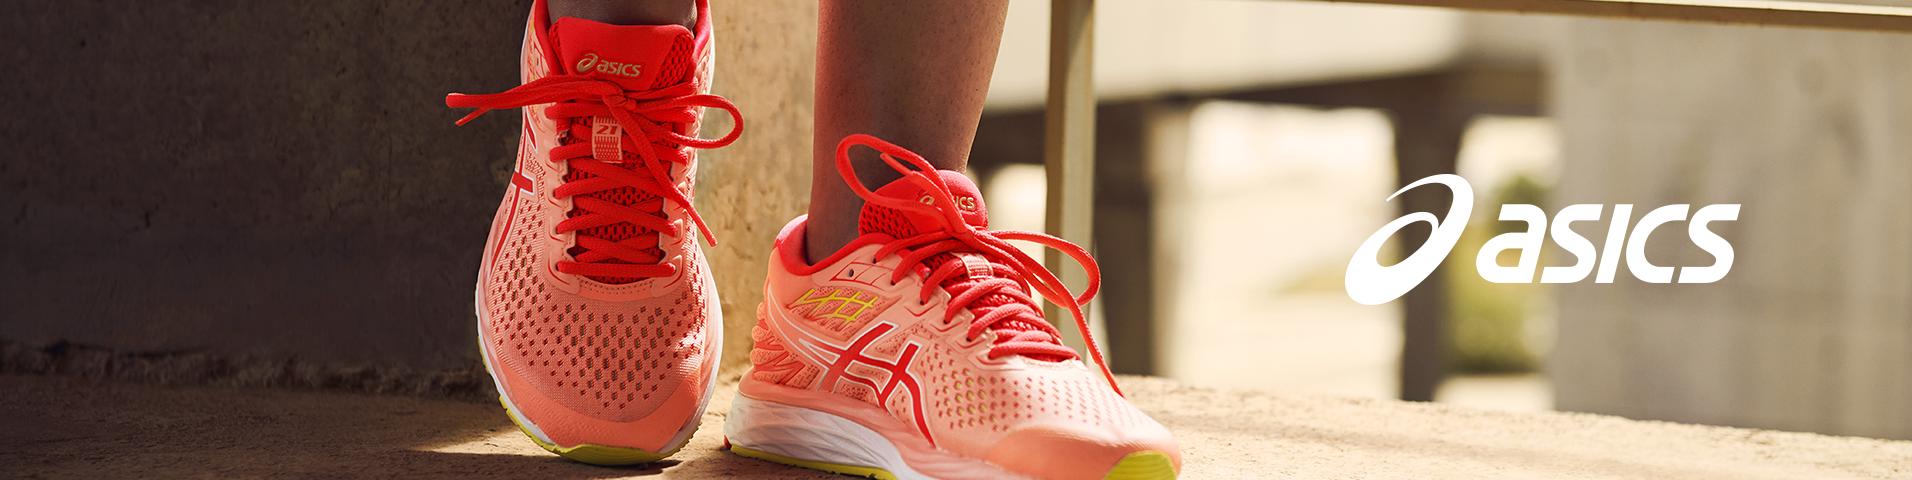 ASICS Sportschuhe für Damen | Bei den Schuhen fängt es an | ZALANDO